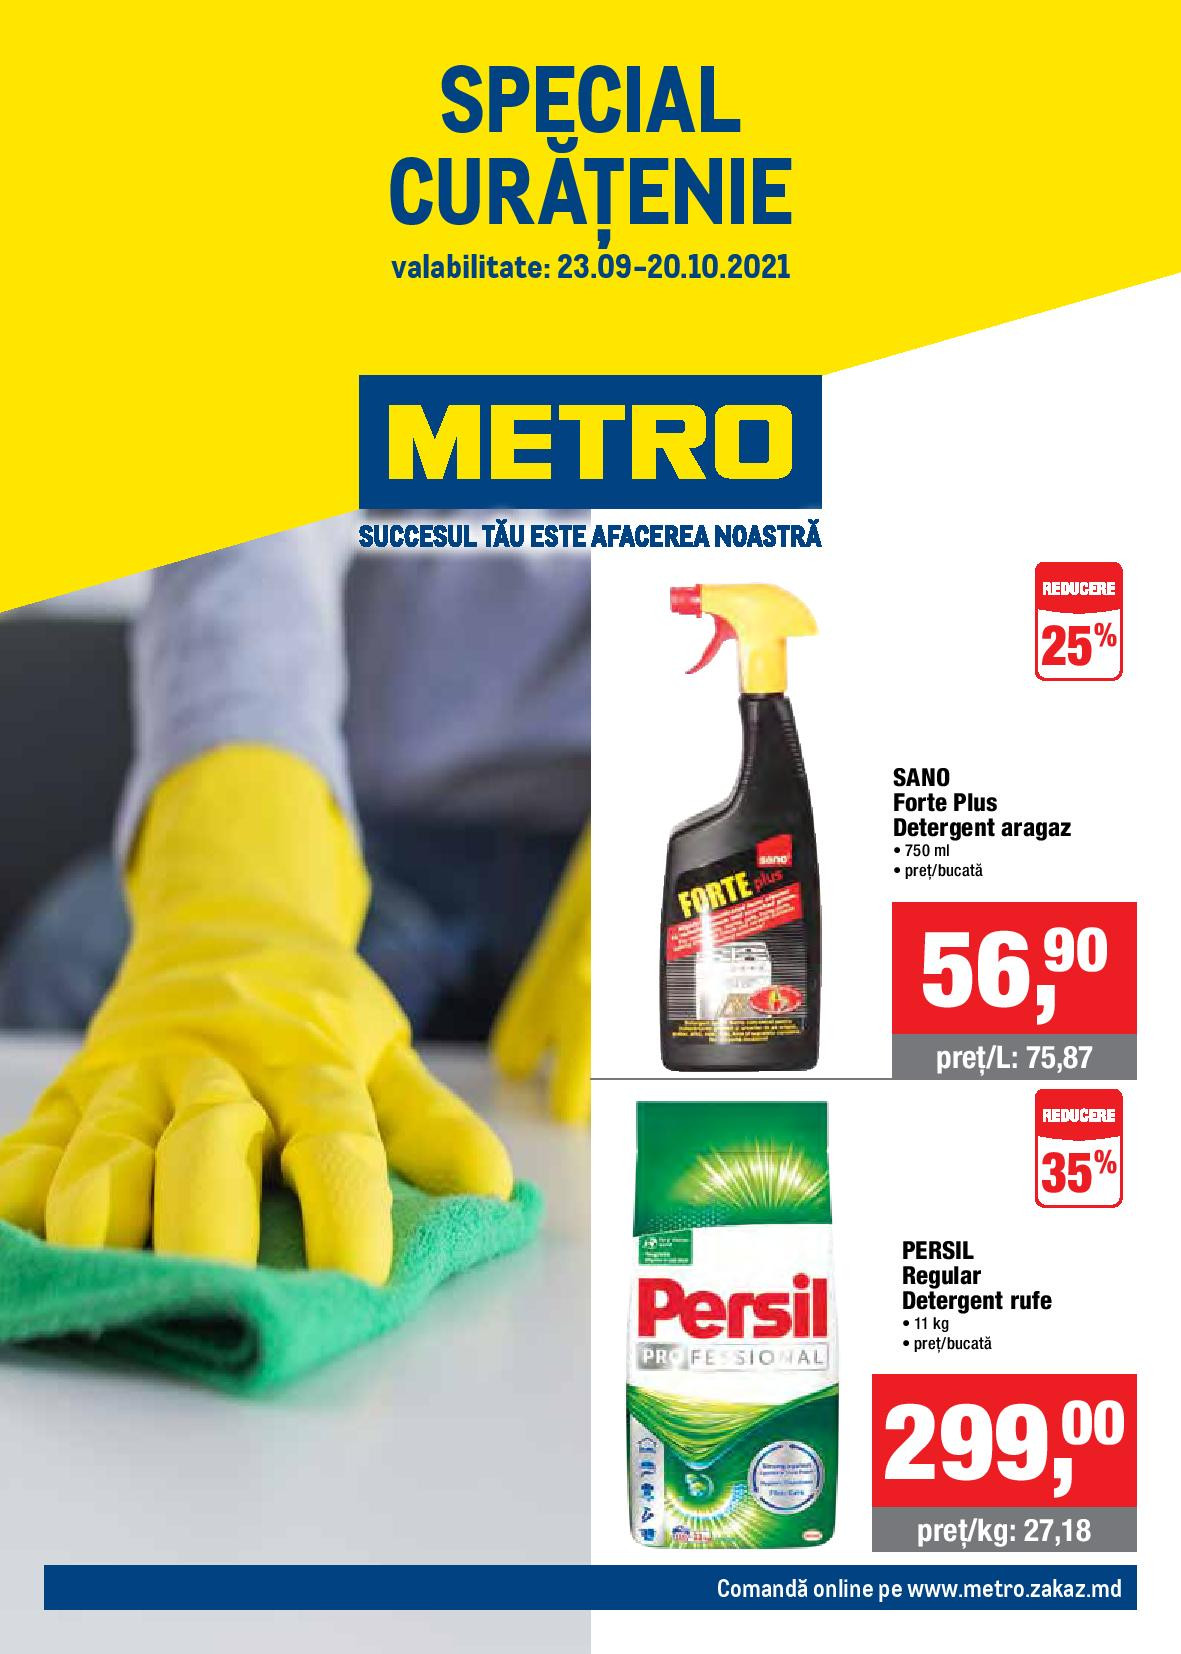 METRO: Catalog Special Curățenie (NR. 20)